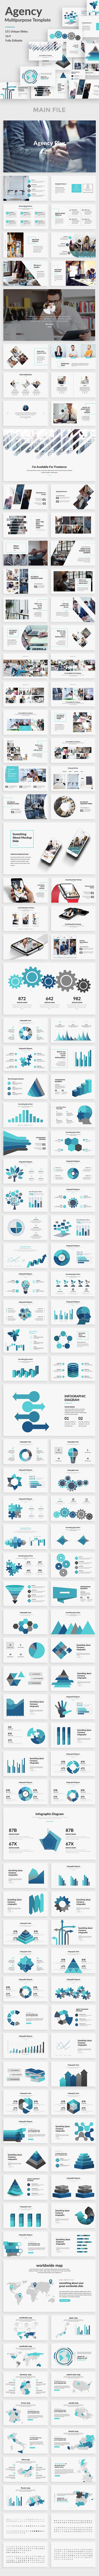 Agency Plus Multipurpose Google Slide Template - Google Slides Presentation Templates